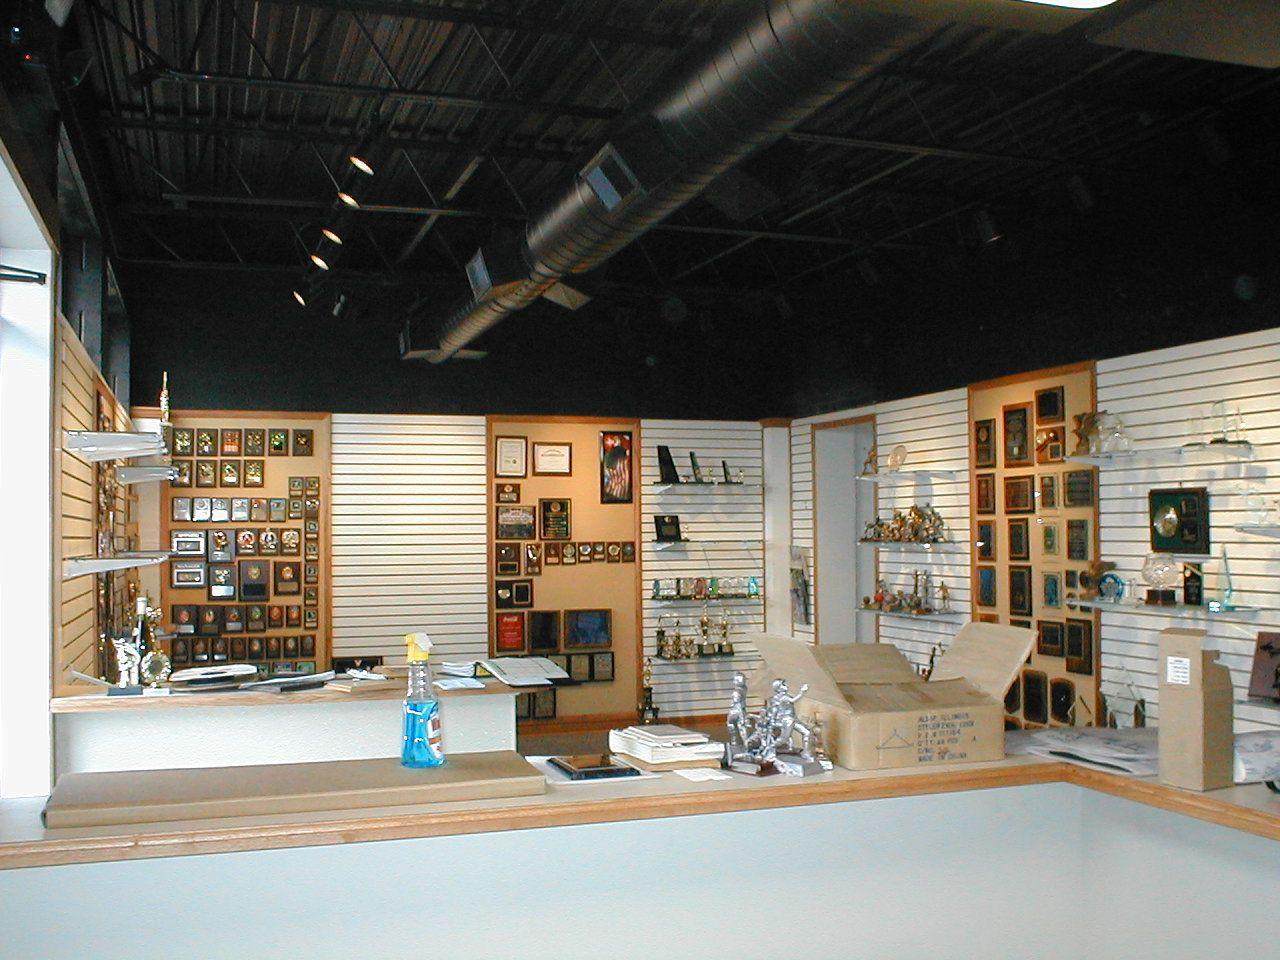 paint basement ceiling pipes plans regent park. Black Bedroom Furniture Sets. Home Design Ideas